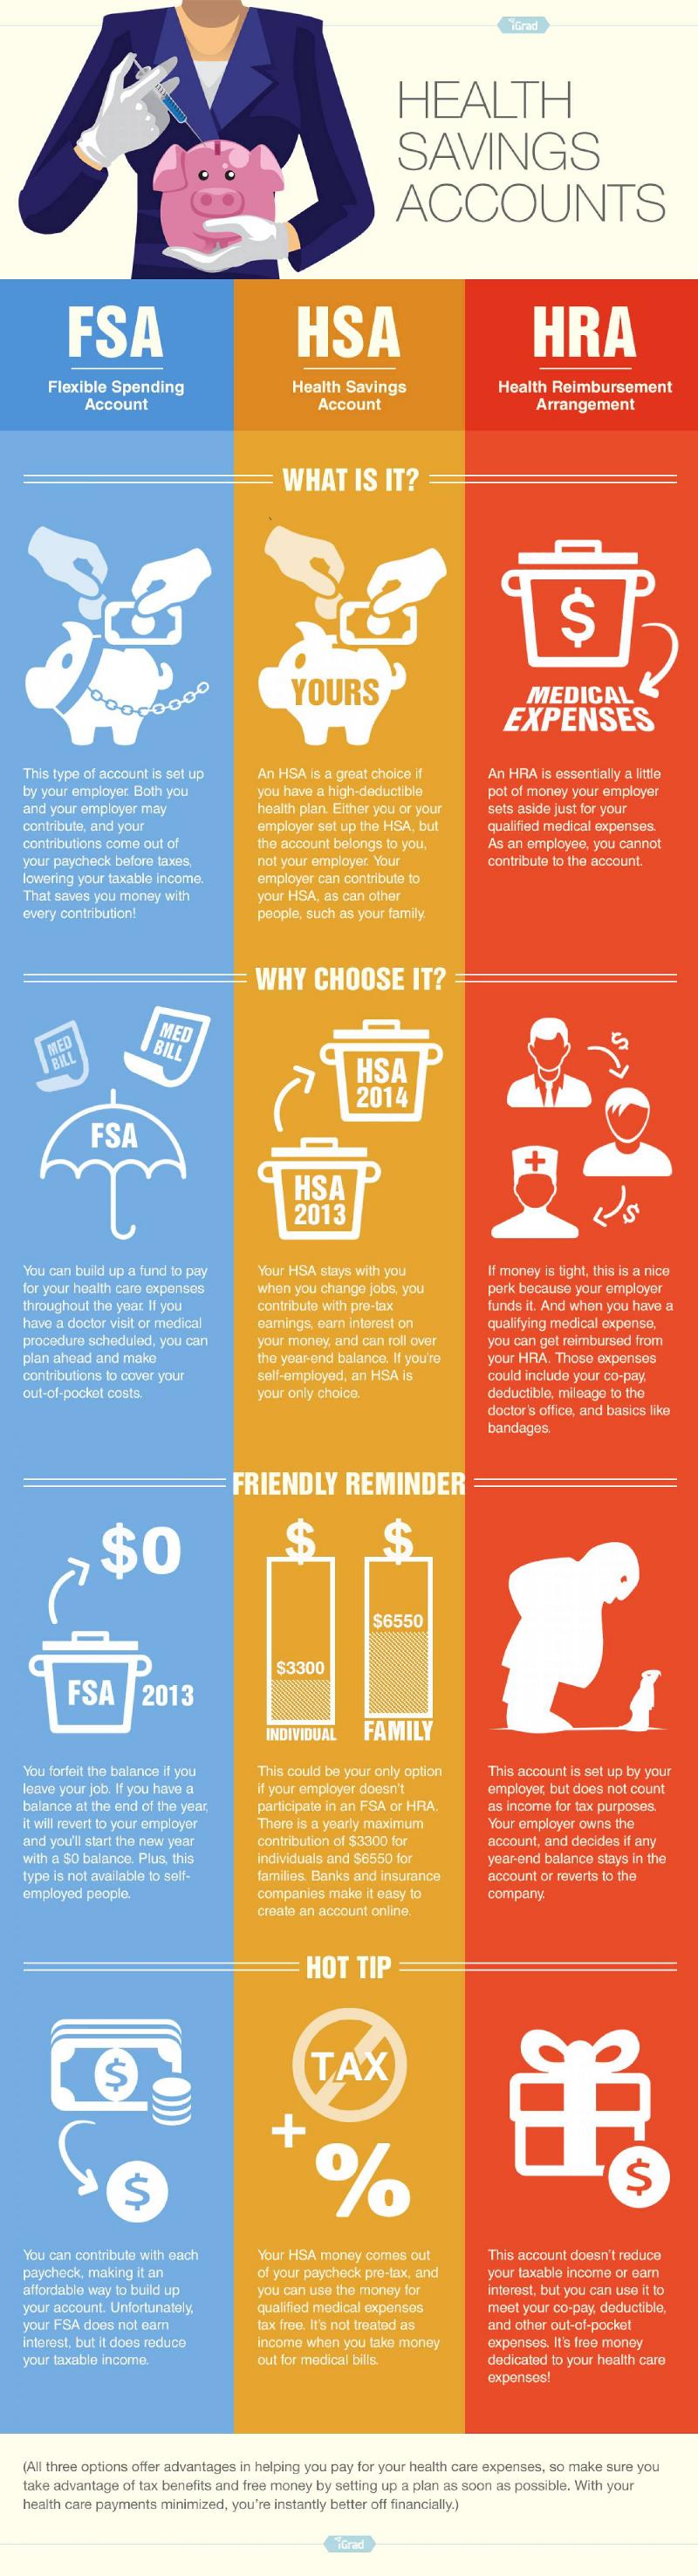 Health Savings Account Comparison